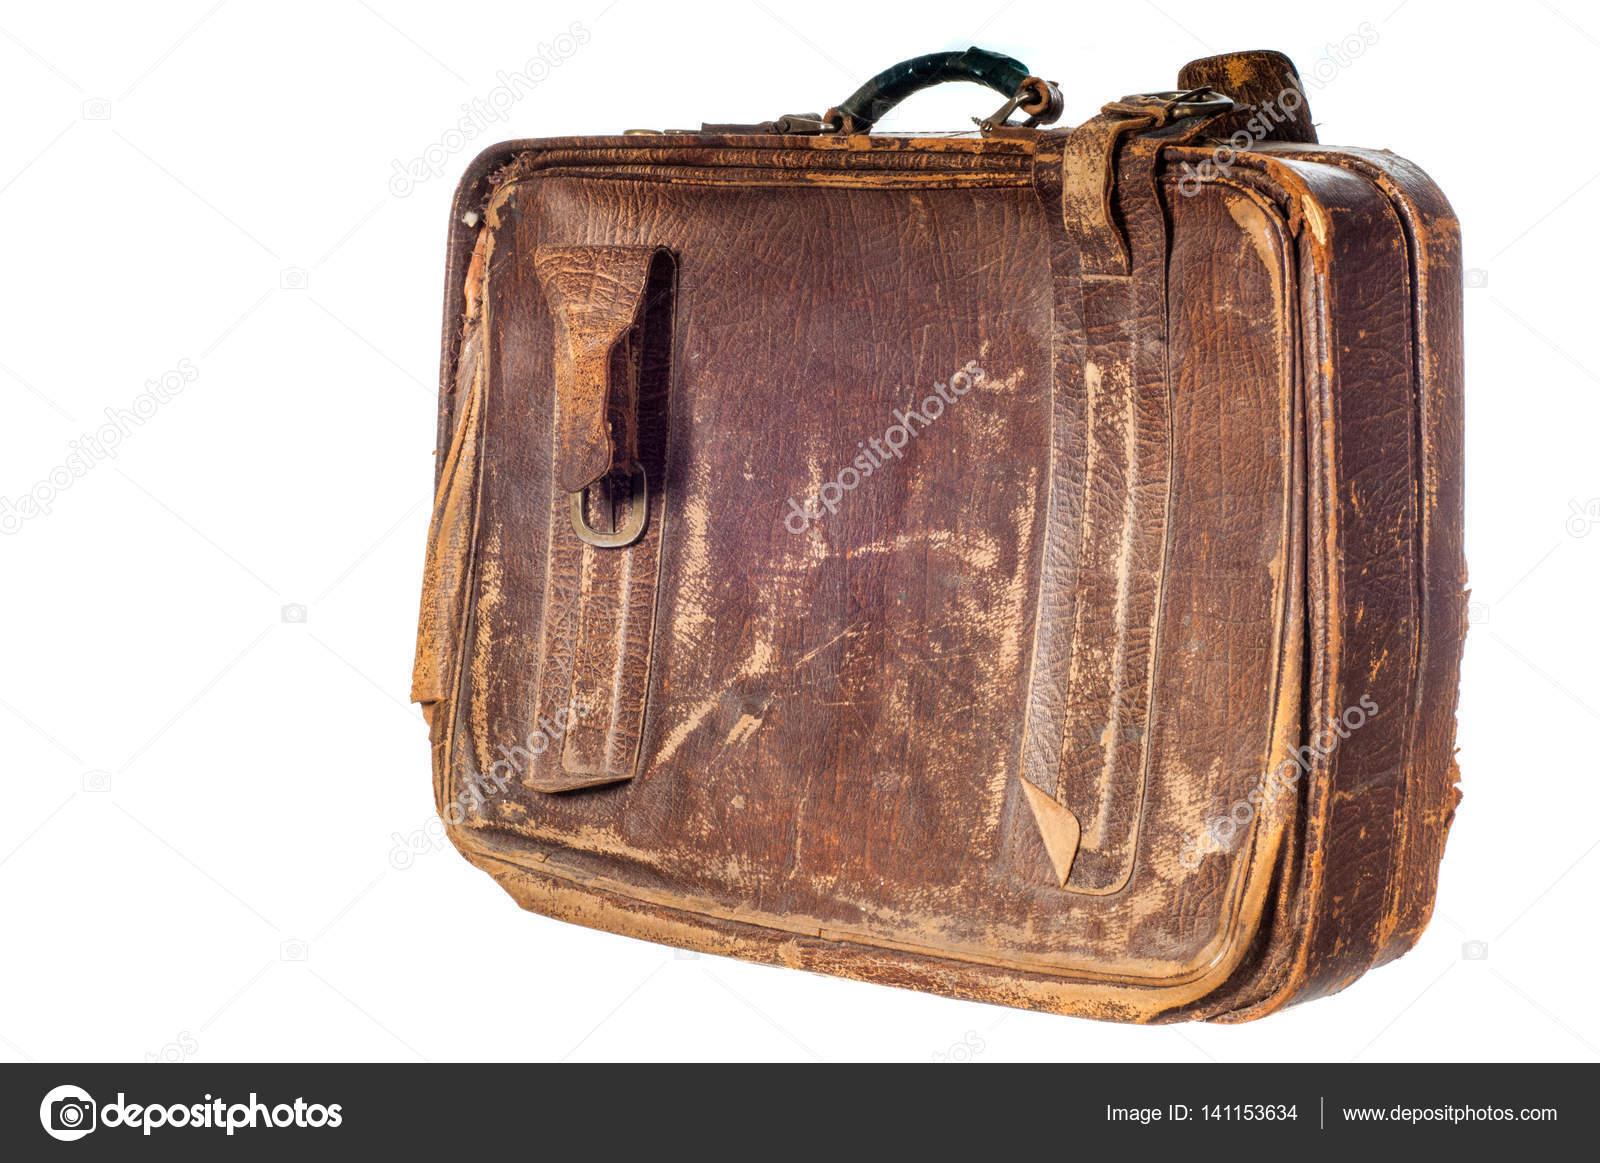 old suitcase texture suitcase bag trunk case handbag valise